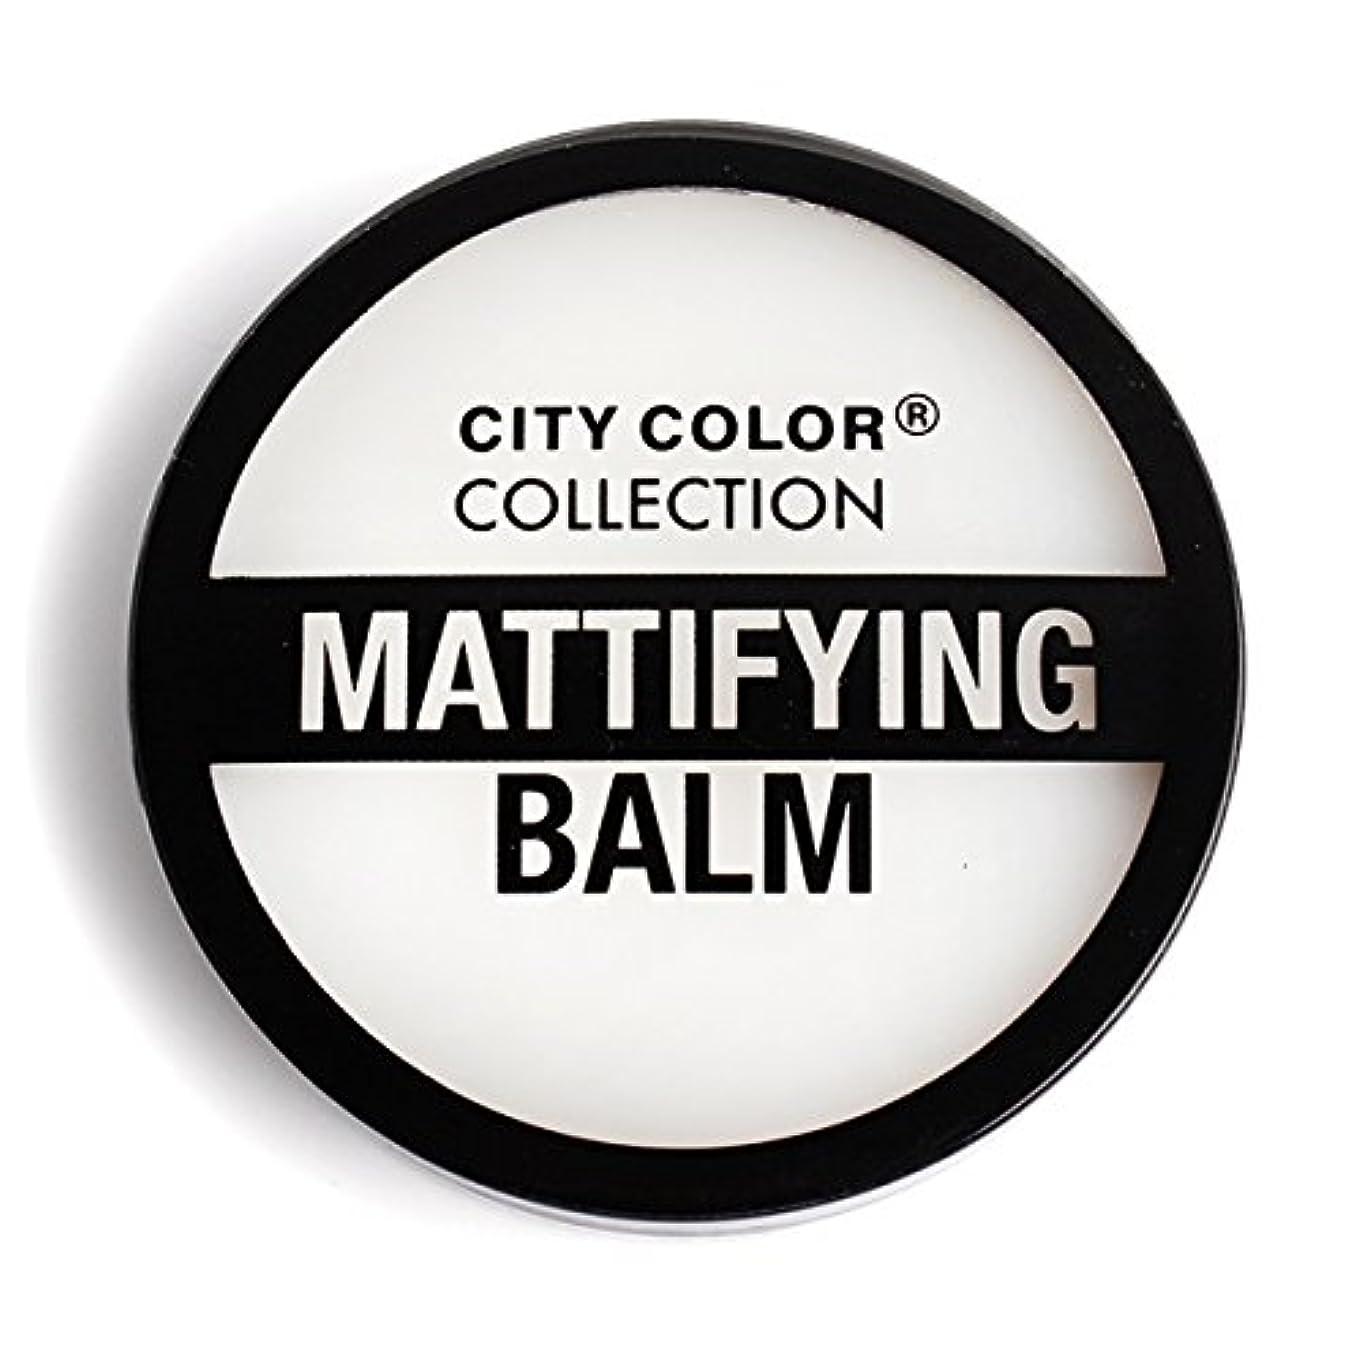 CITY COLOR Mattifying Balm Face Primer (並行輸入品)